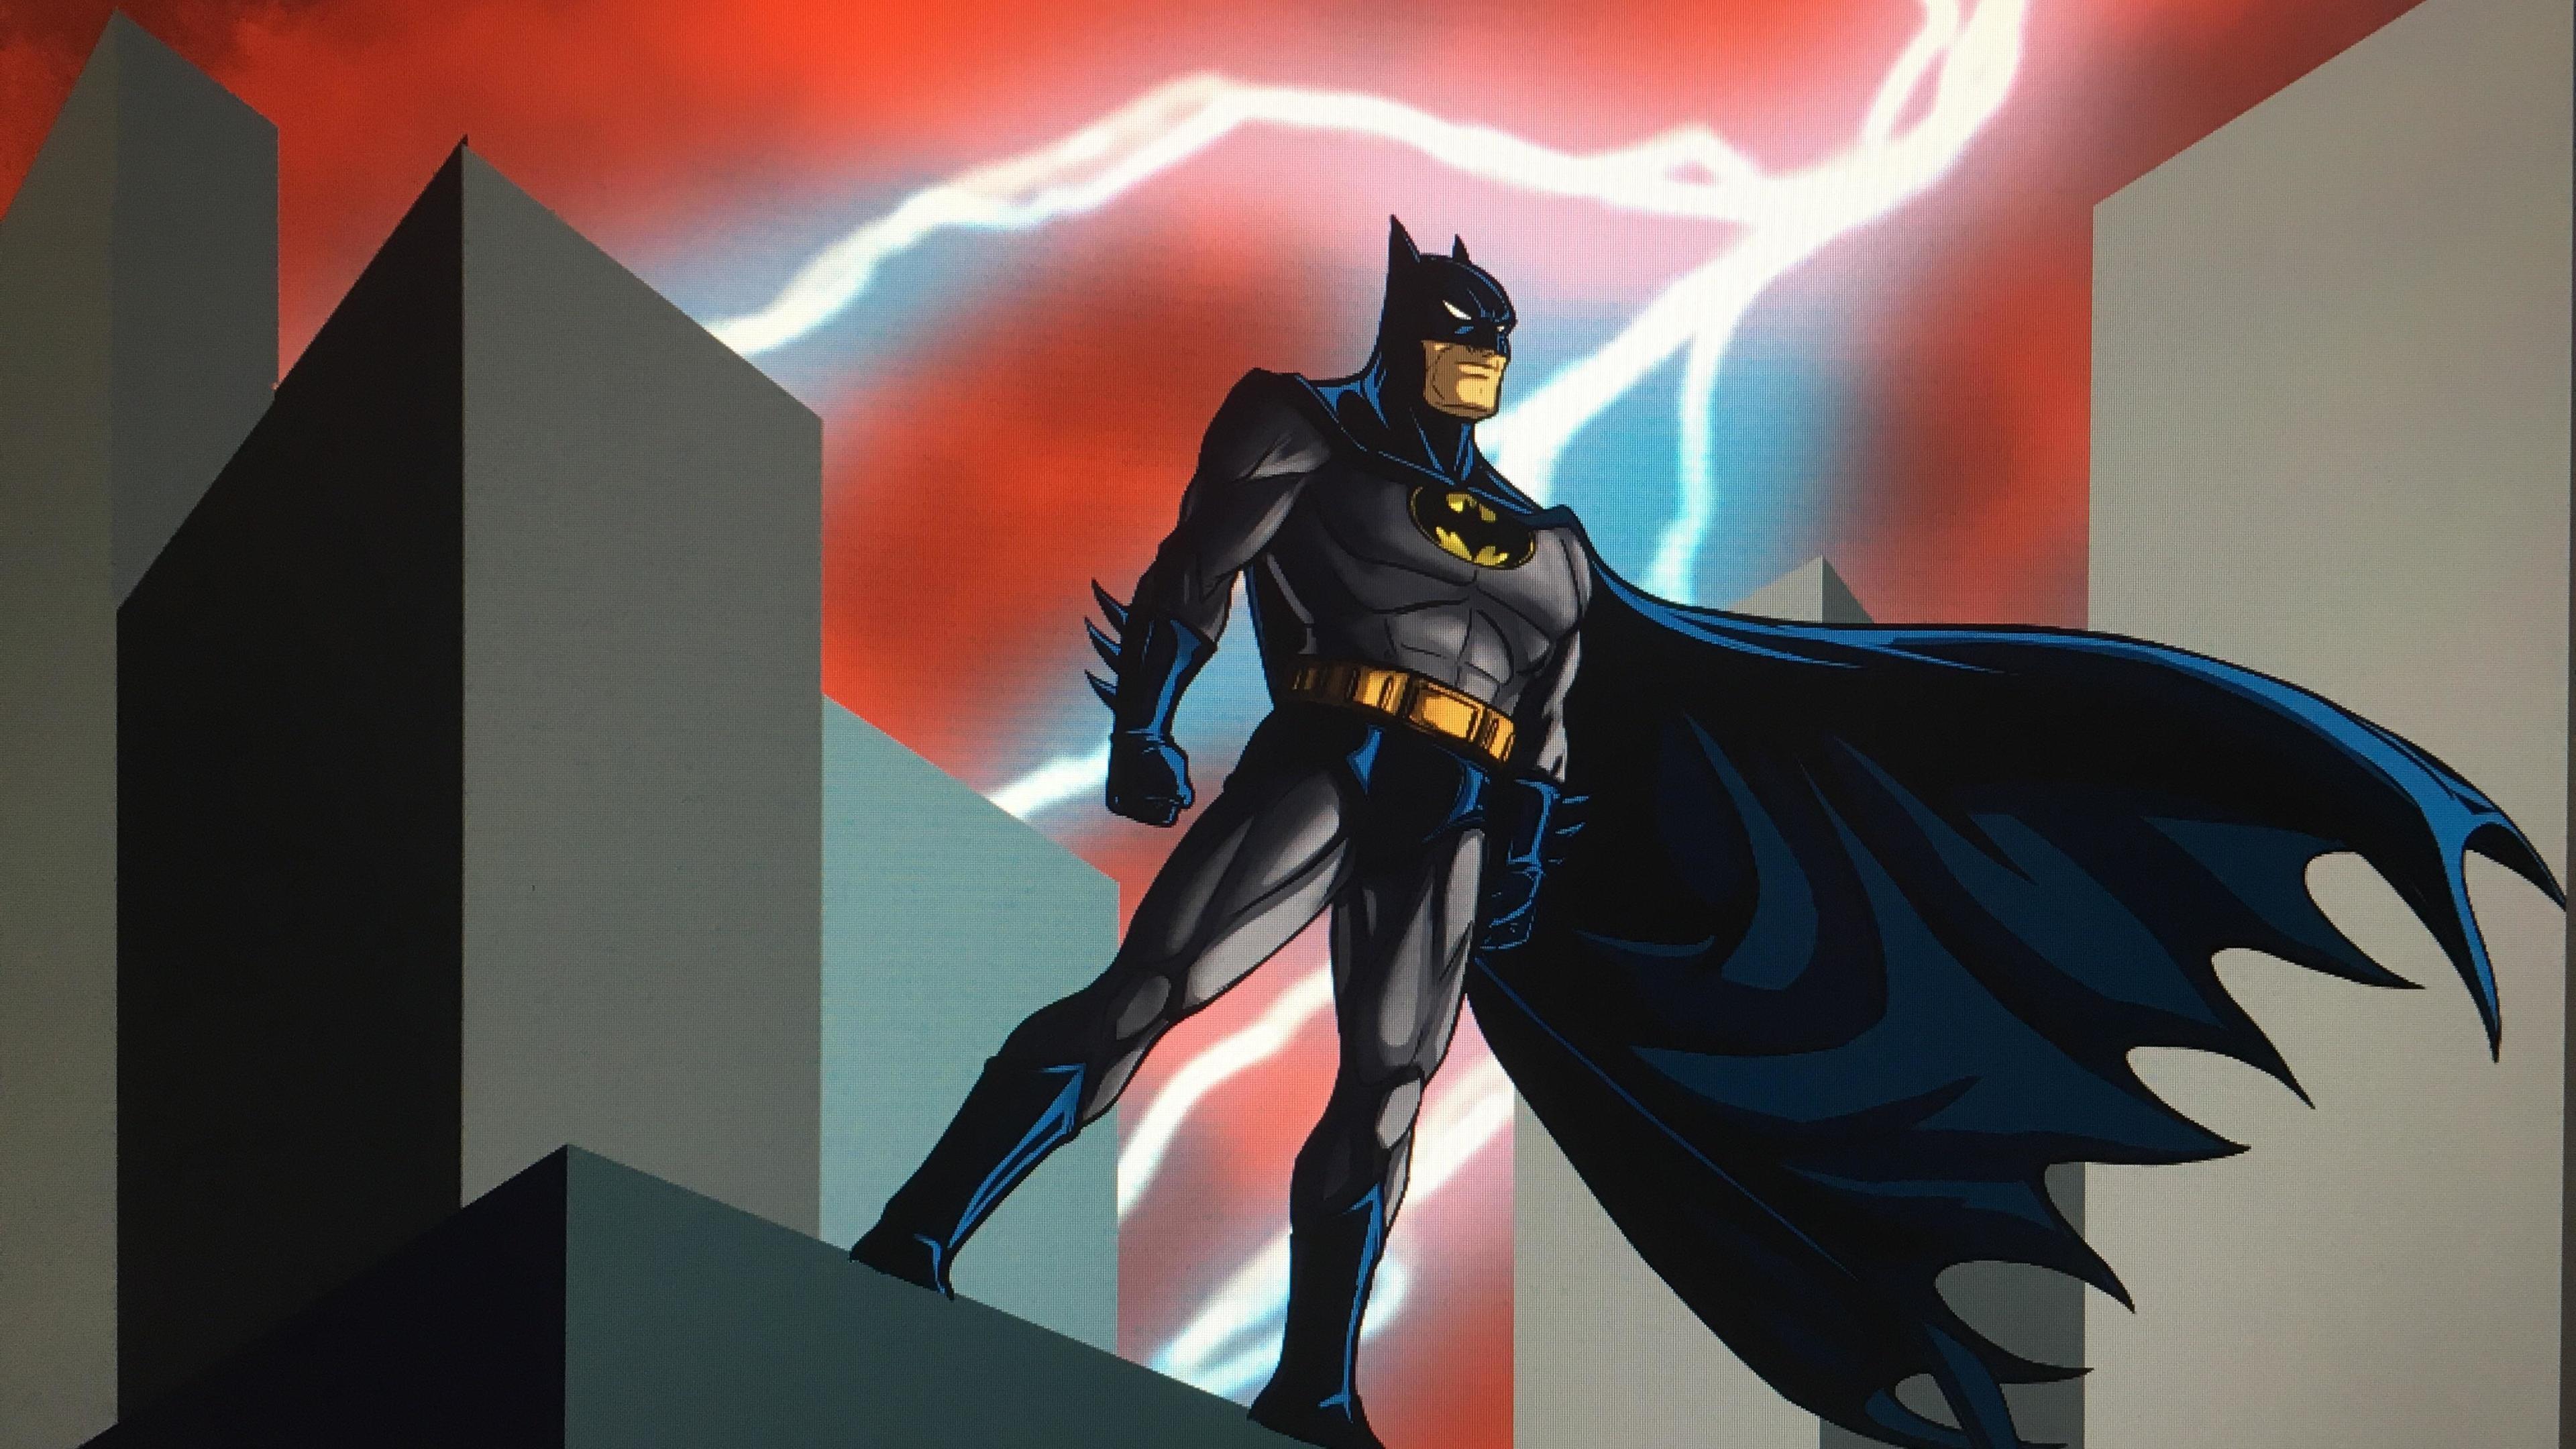 batman watching city 4k 1547936479 - Batman Watching City 4k - superheroes wallpapers, hd-wallpapers, digital art wallpapers, batman wallpapers, artwork wallpapers